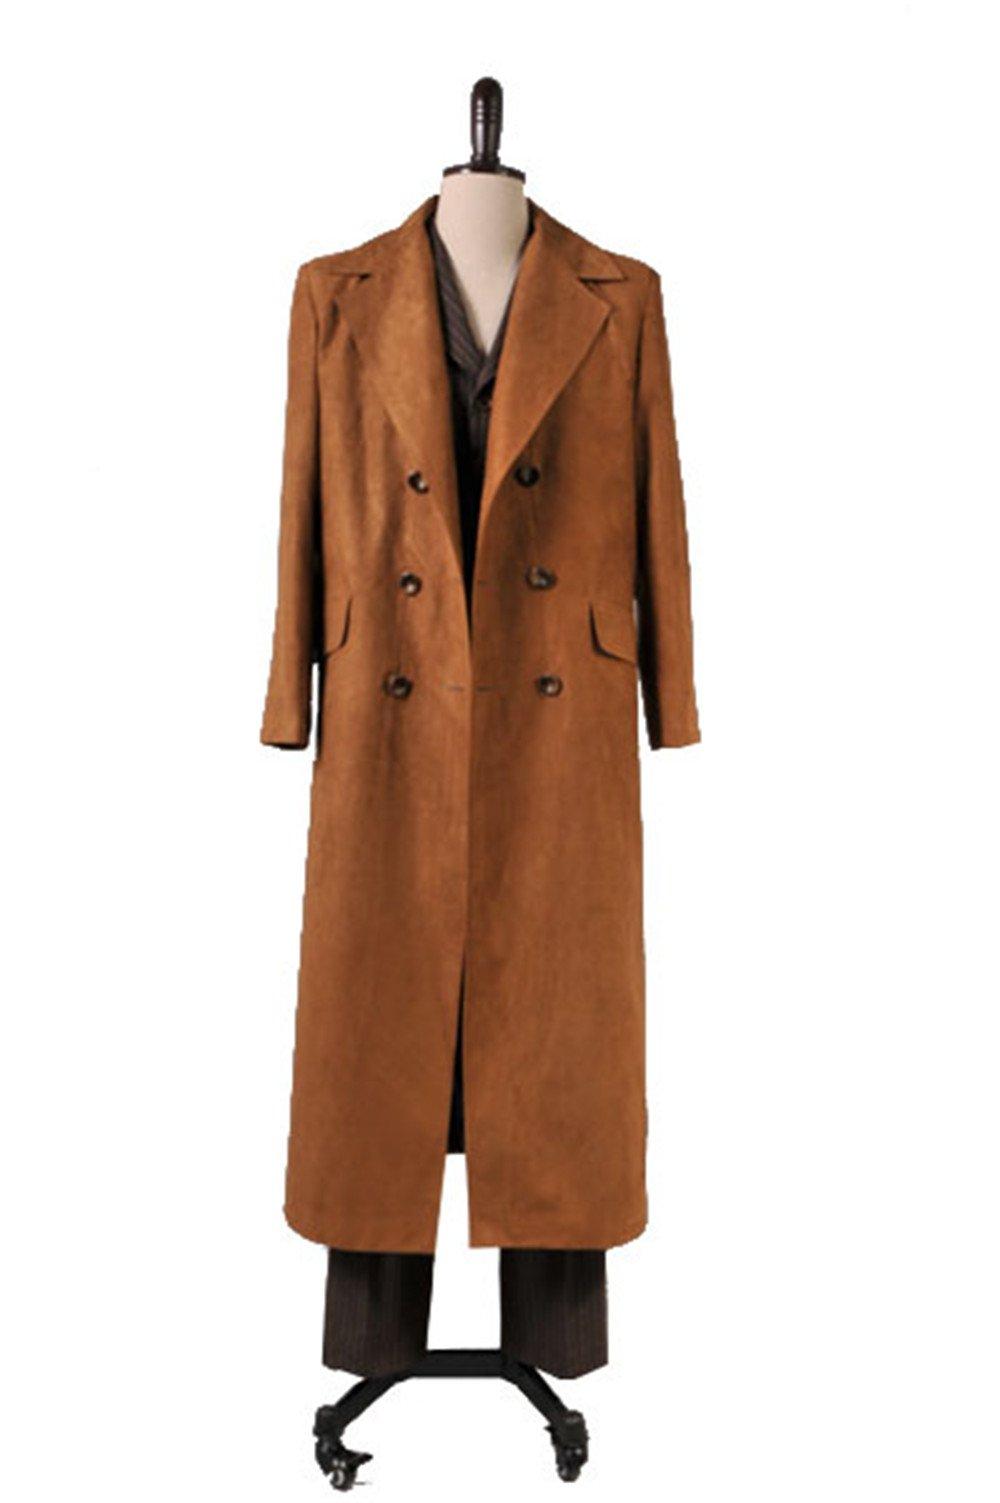 Cosdaddy Men's Doctor Dr. Brown Coat Suit set Cosplay Costume (XL, Full Set)